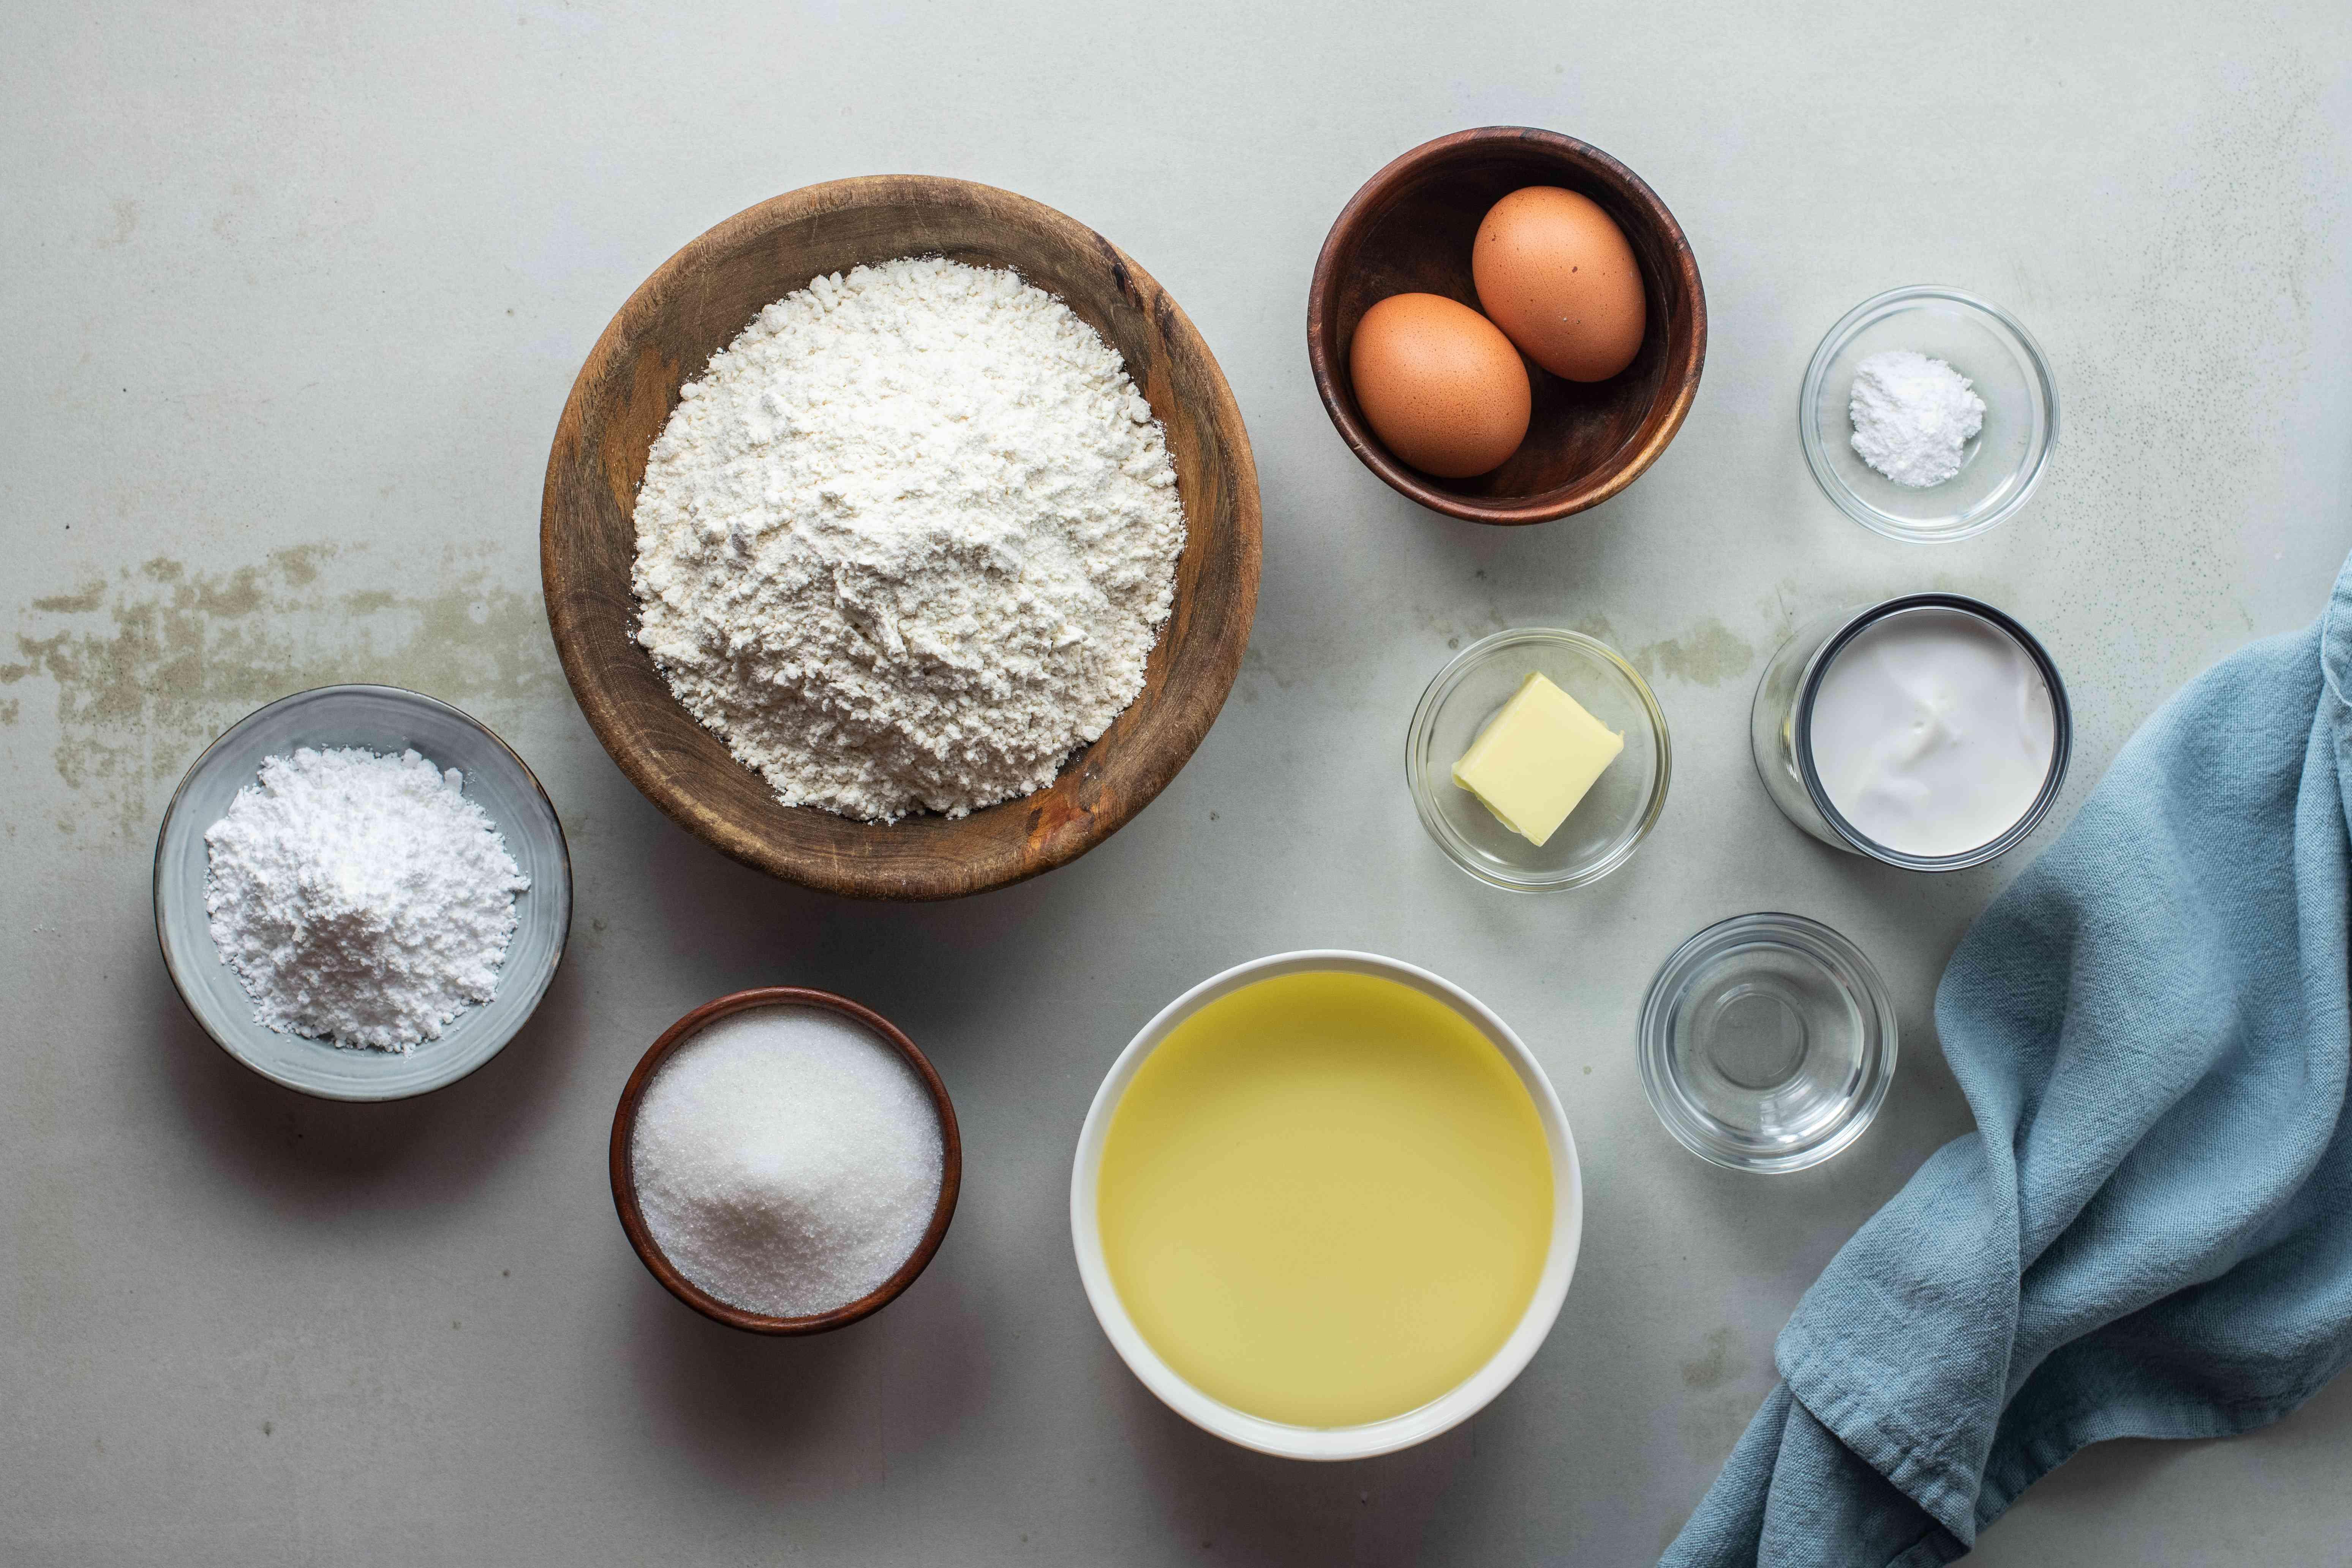 Ingredients for kulkuls